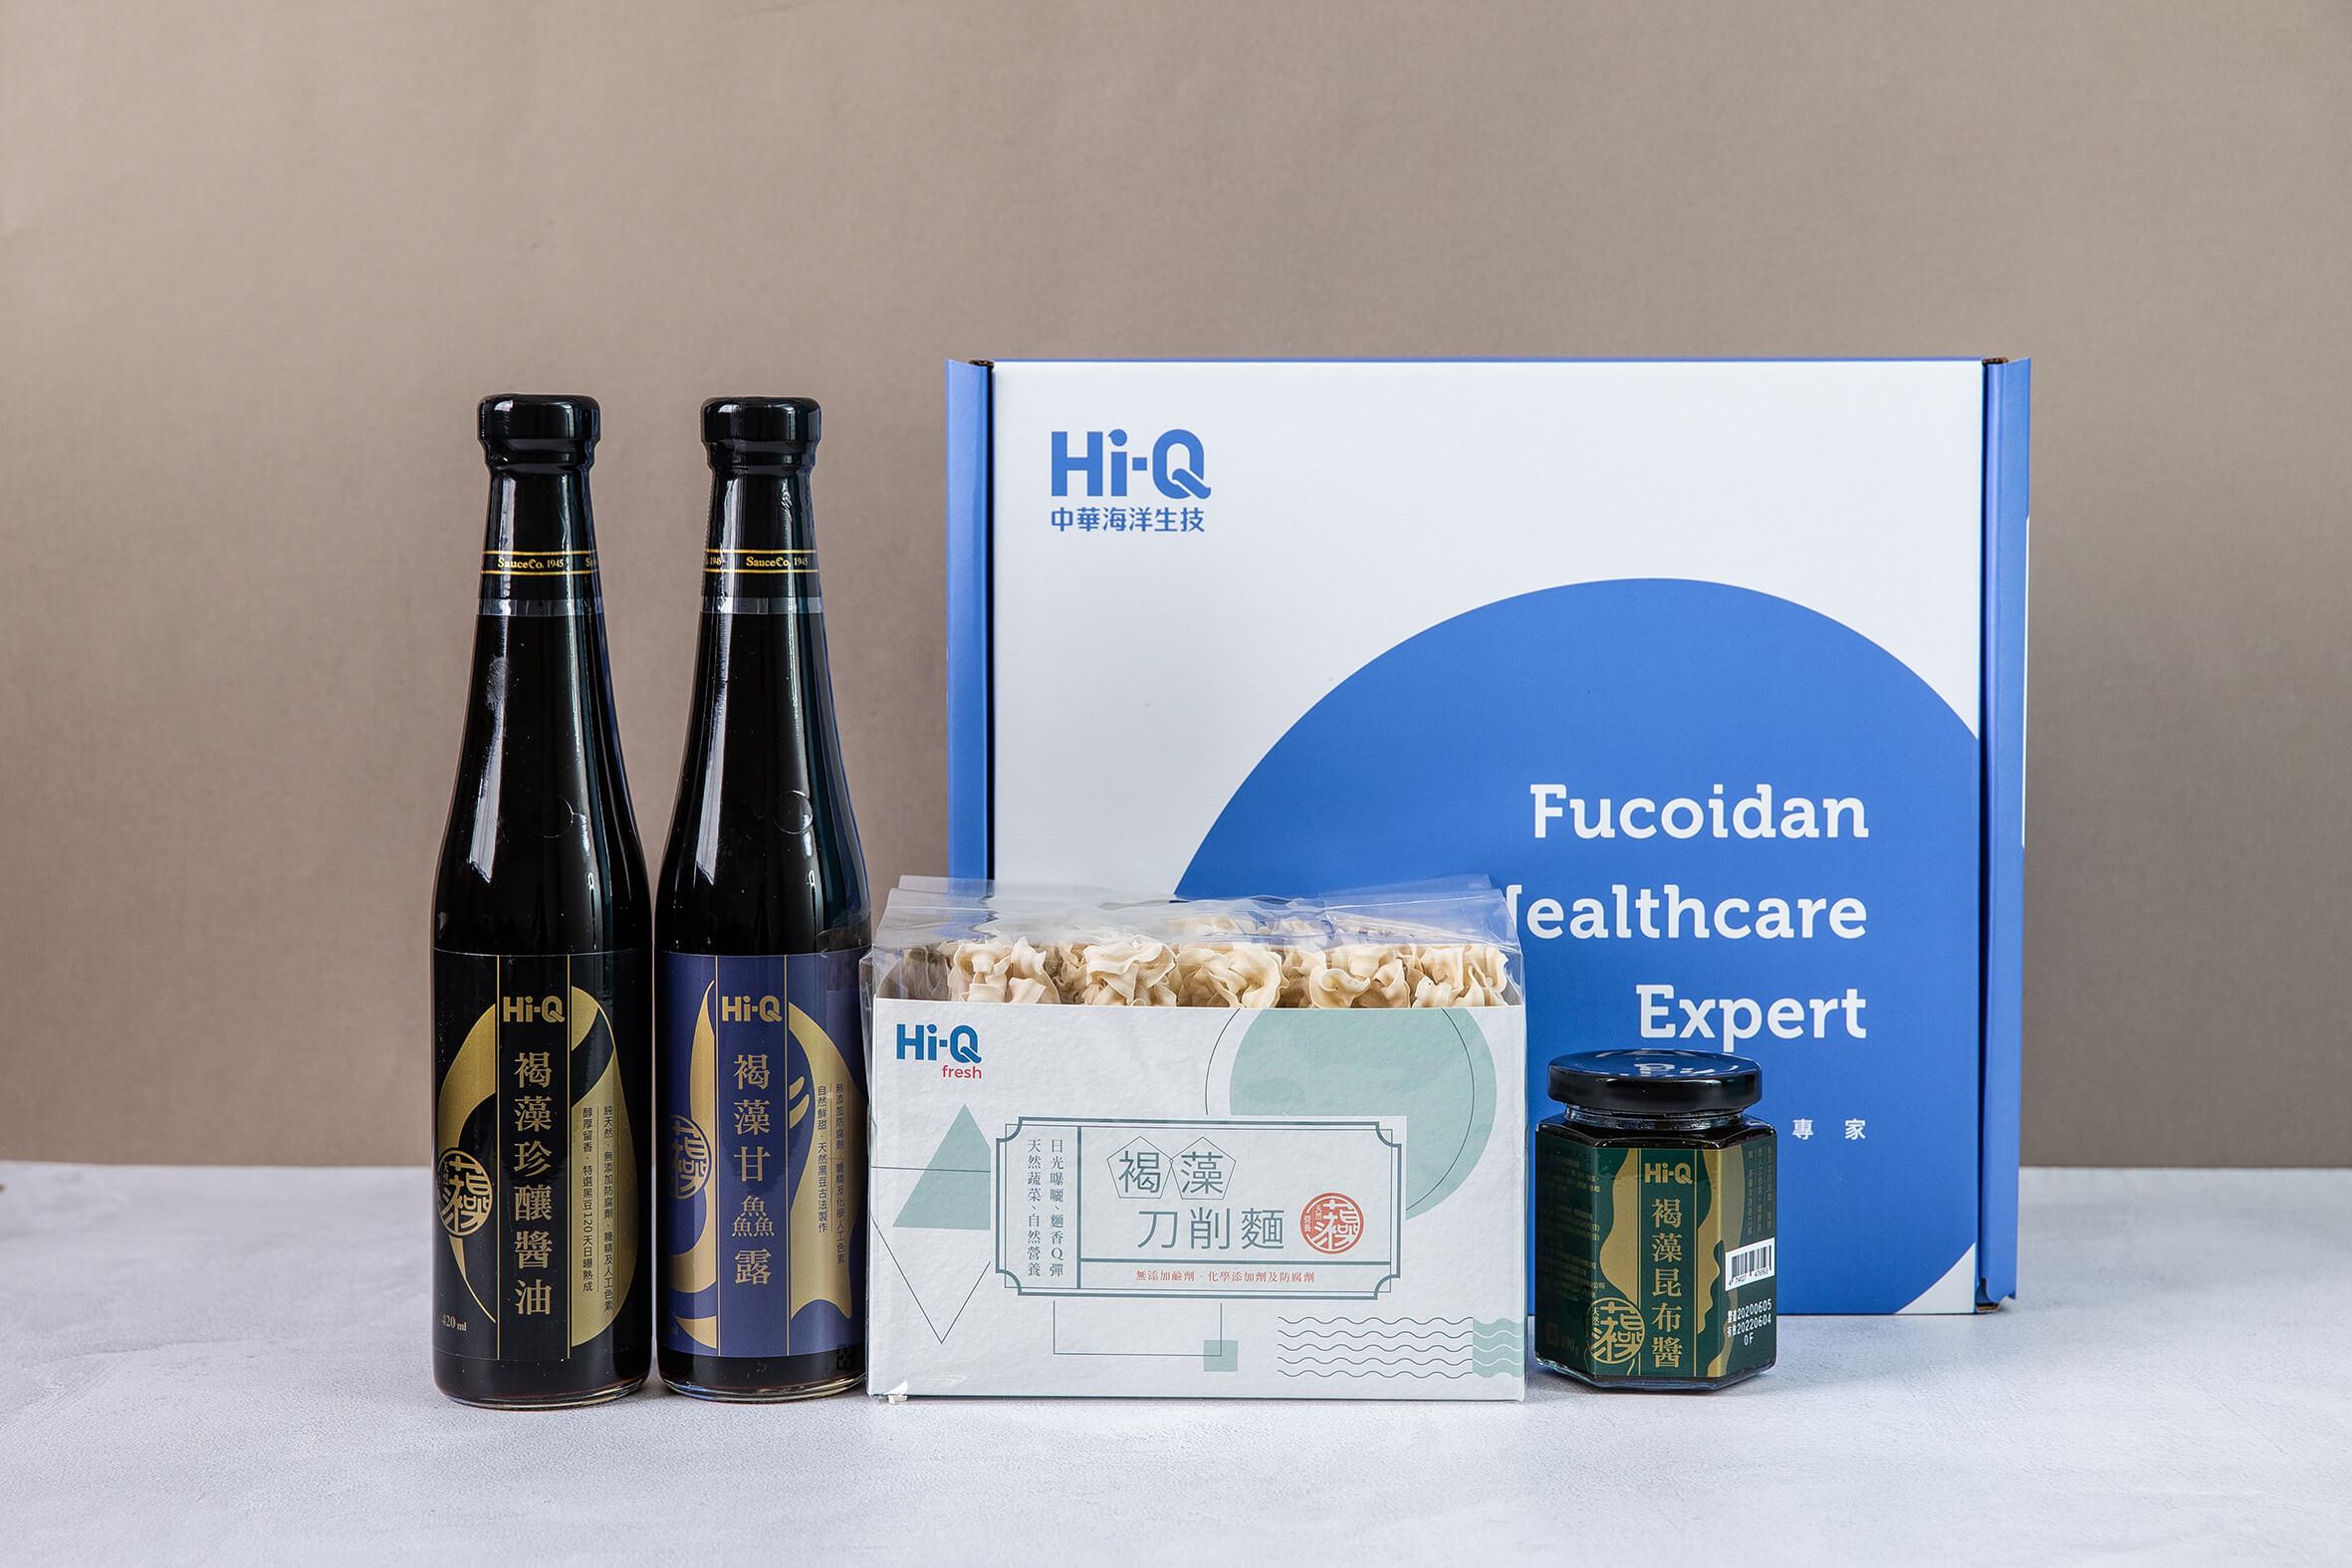 【Hi-Q fresh】經典好拌禮盒(刀削麵+醬油+甘鮮露+昆布醬)